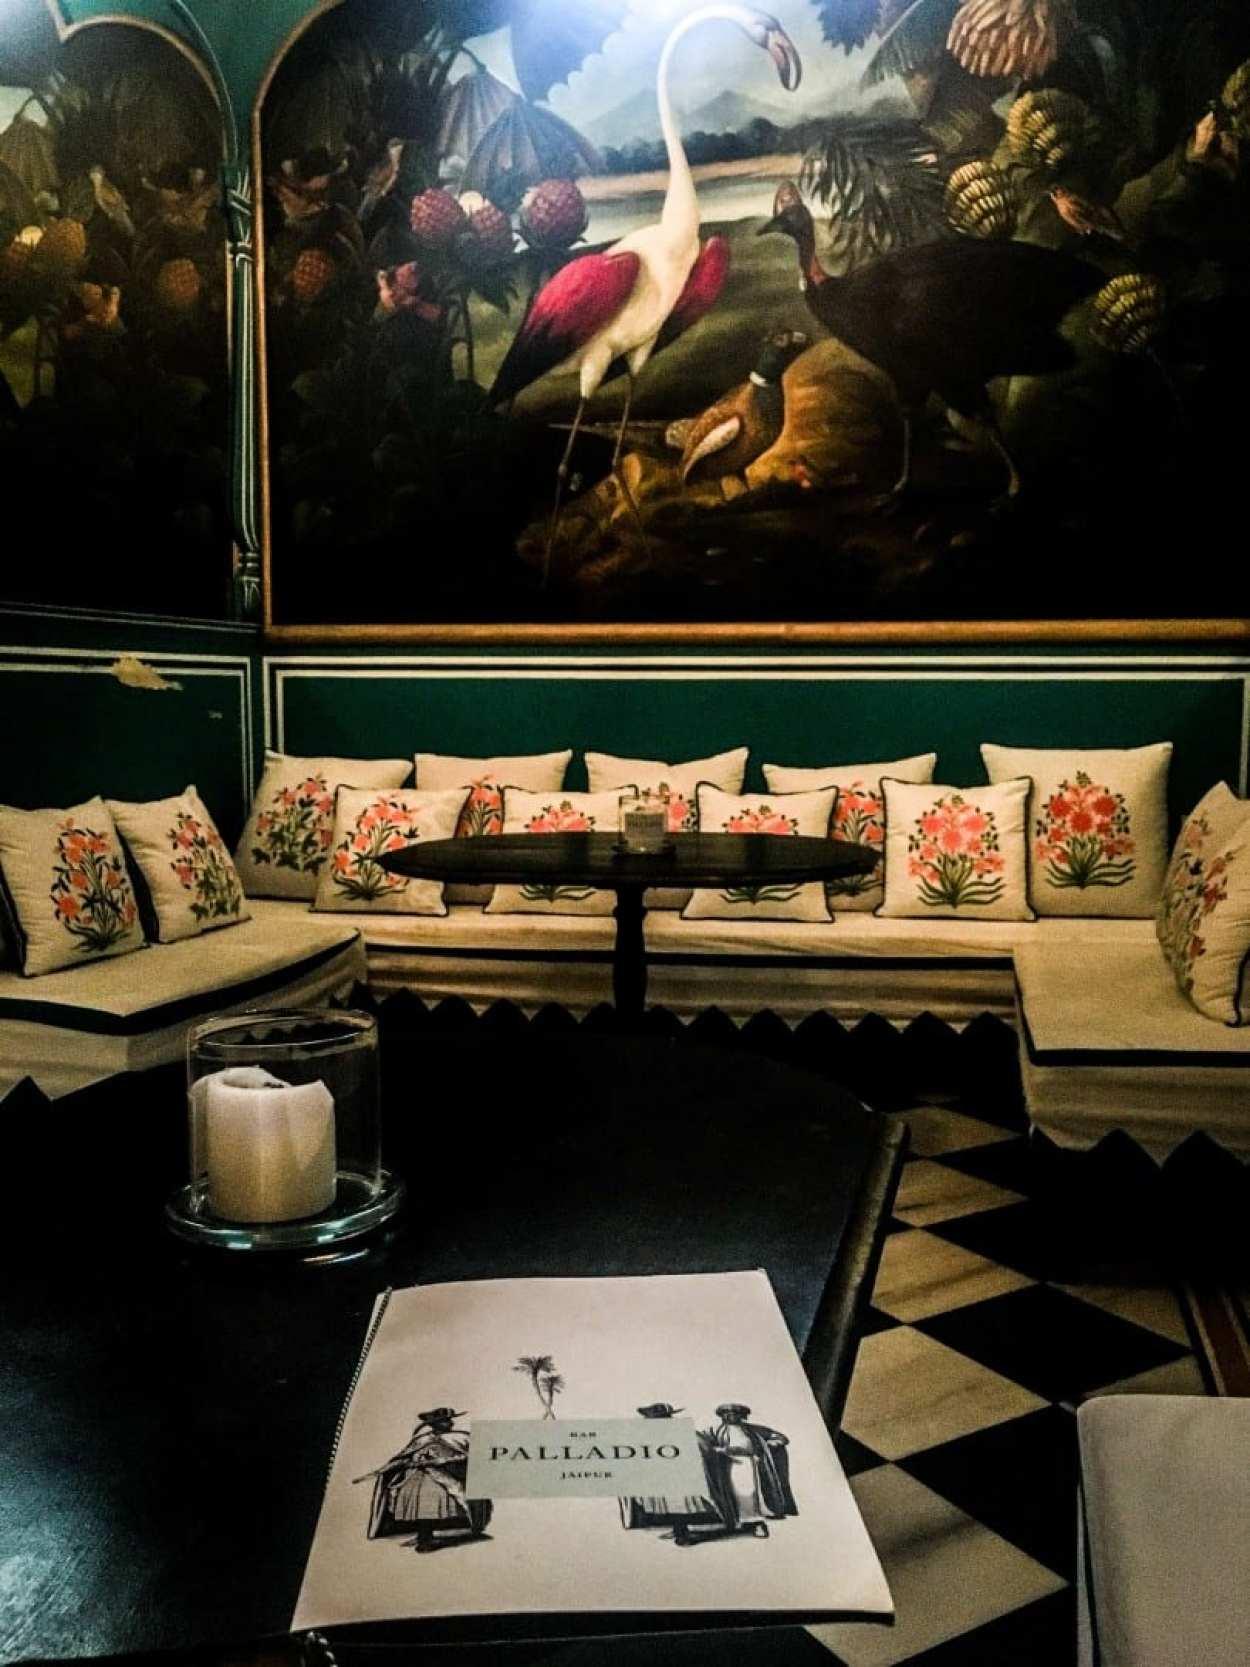 bar palladio jaipur review